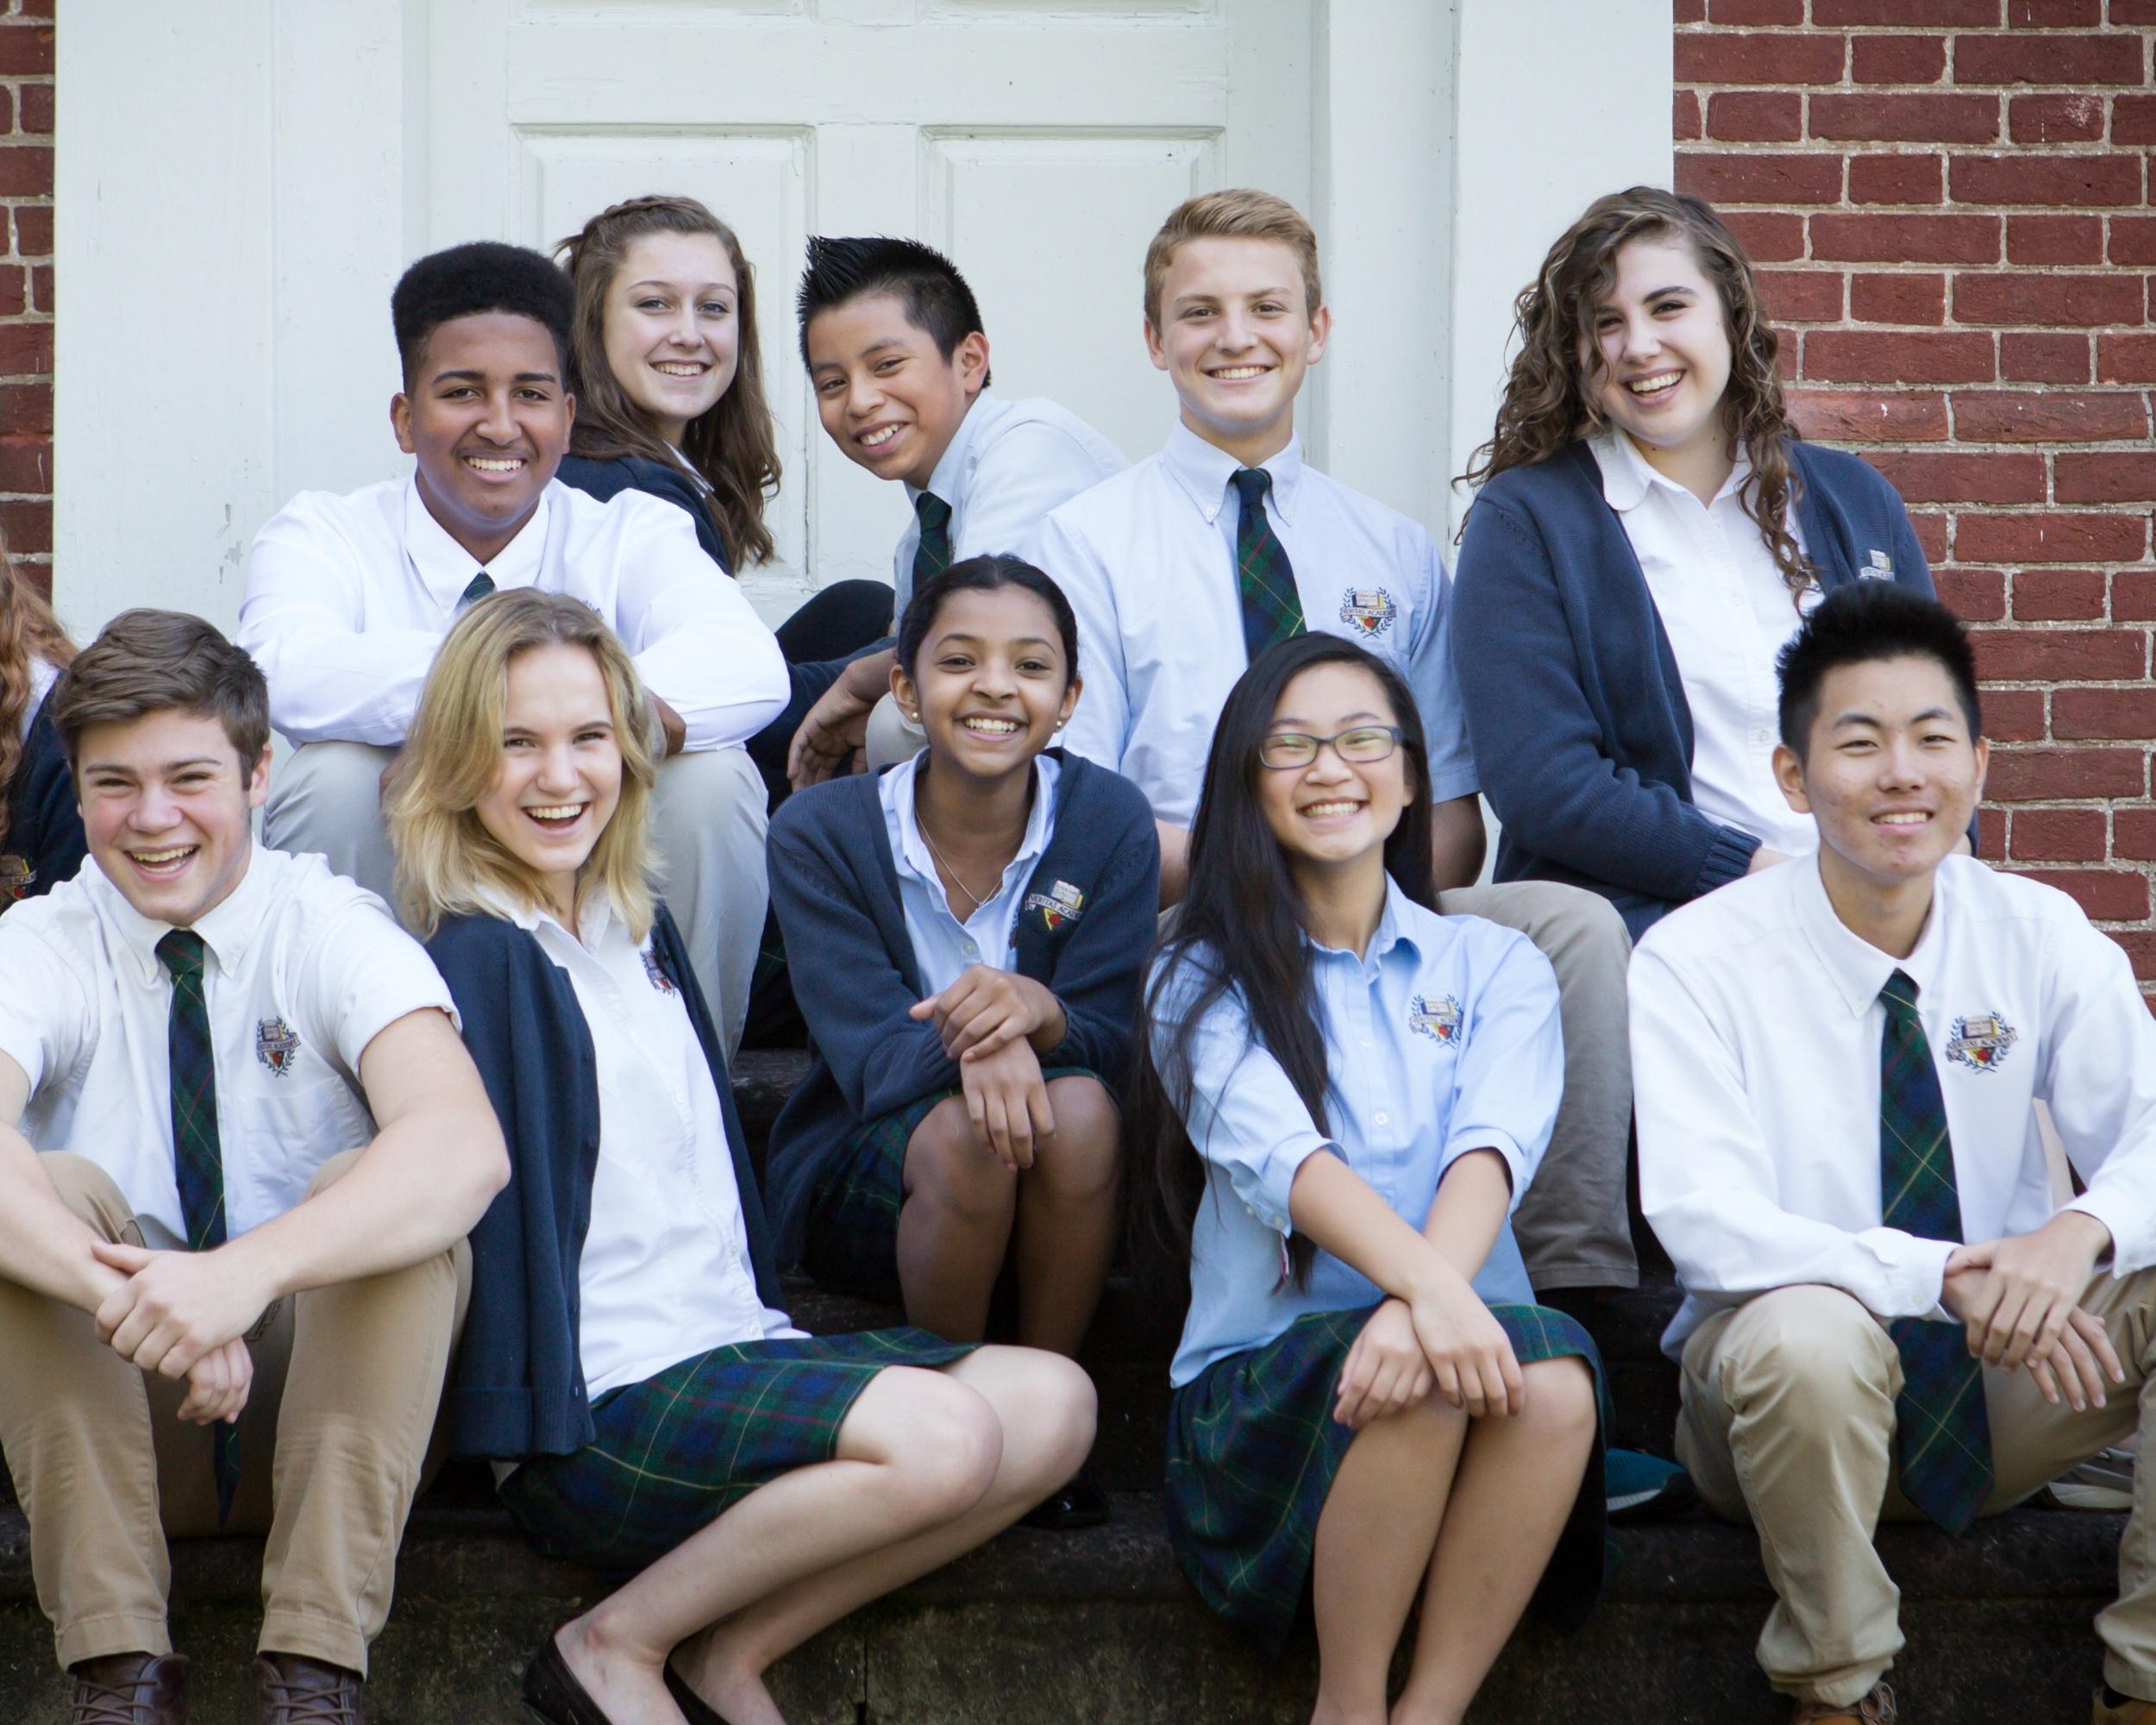 open_house | Veritas Academy | Classical Christian School